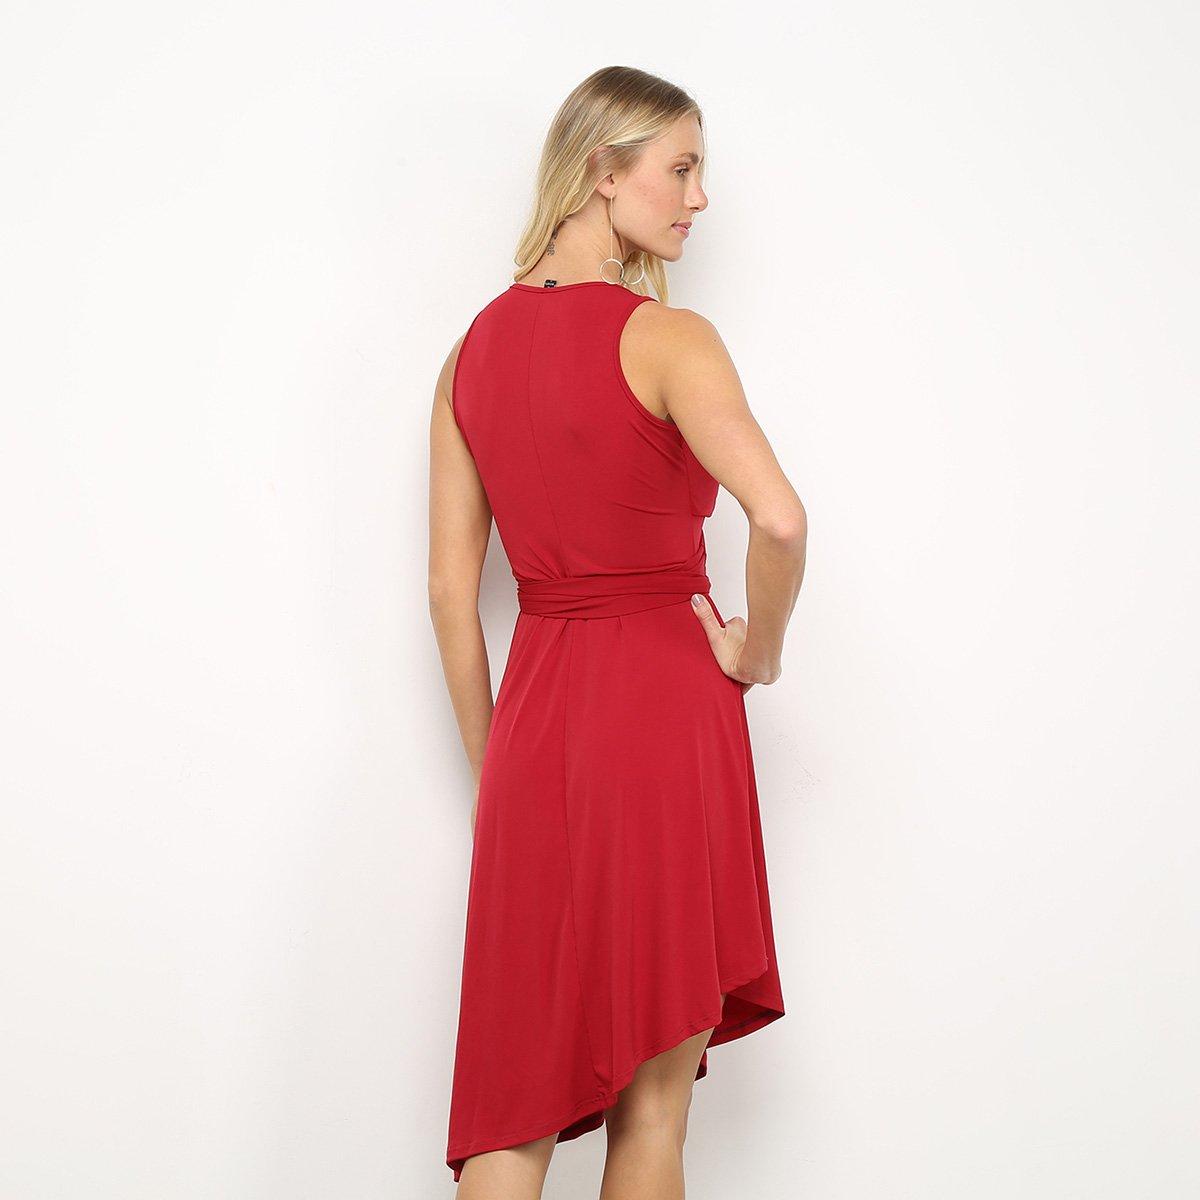 Vestido Mercatto Evasê Midi Assimétrico Transpassado - Vermelho Escuro